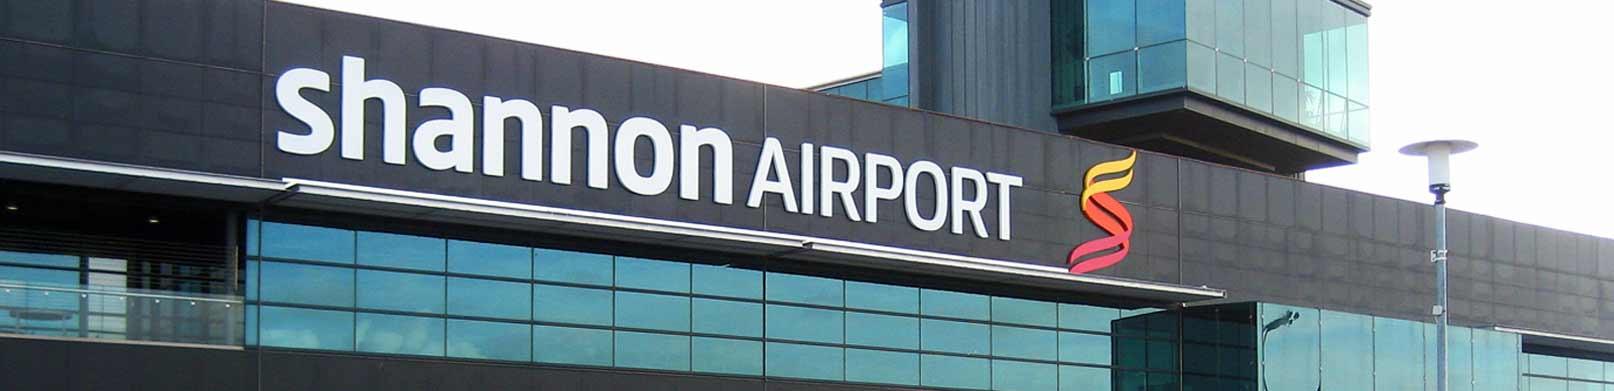 shannon-airport.jpg